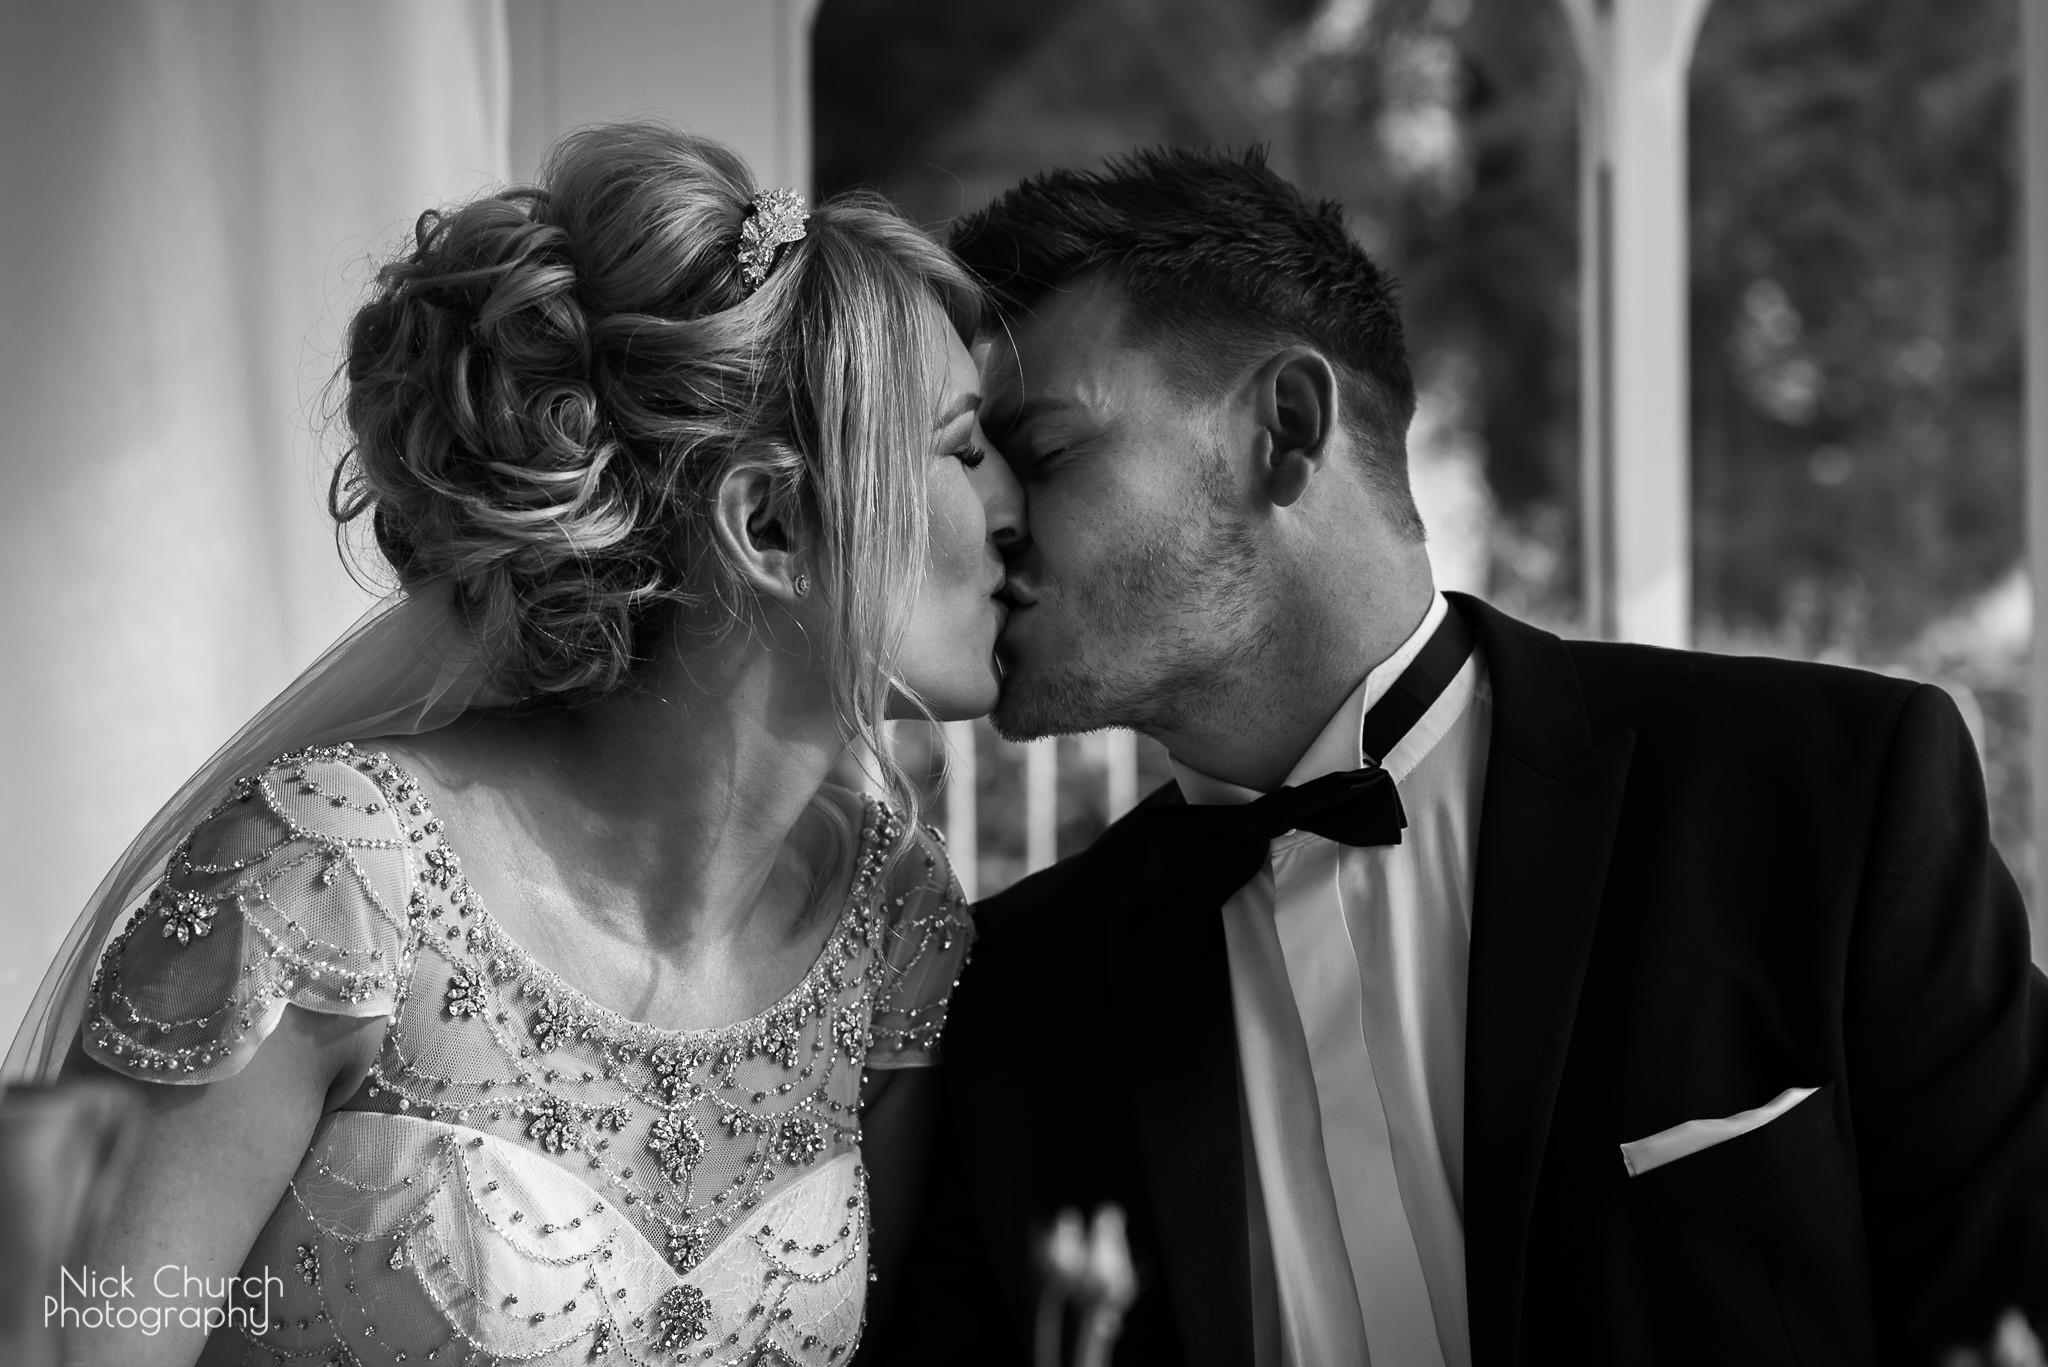 NC-20180317-stacy-and-mike-wedding-0653.jpg